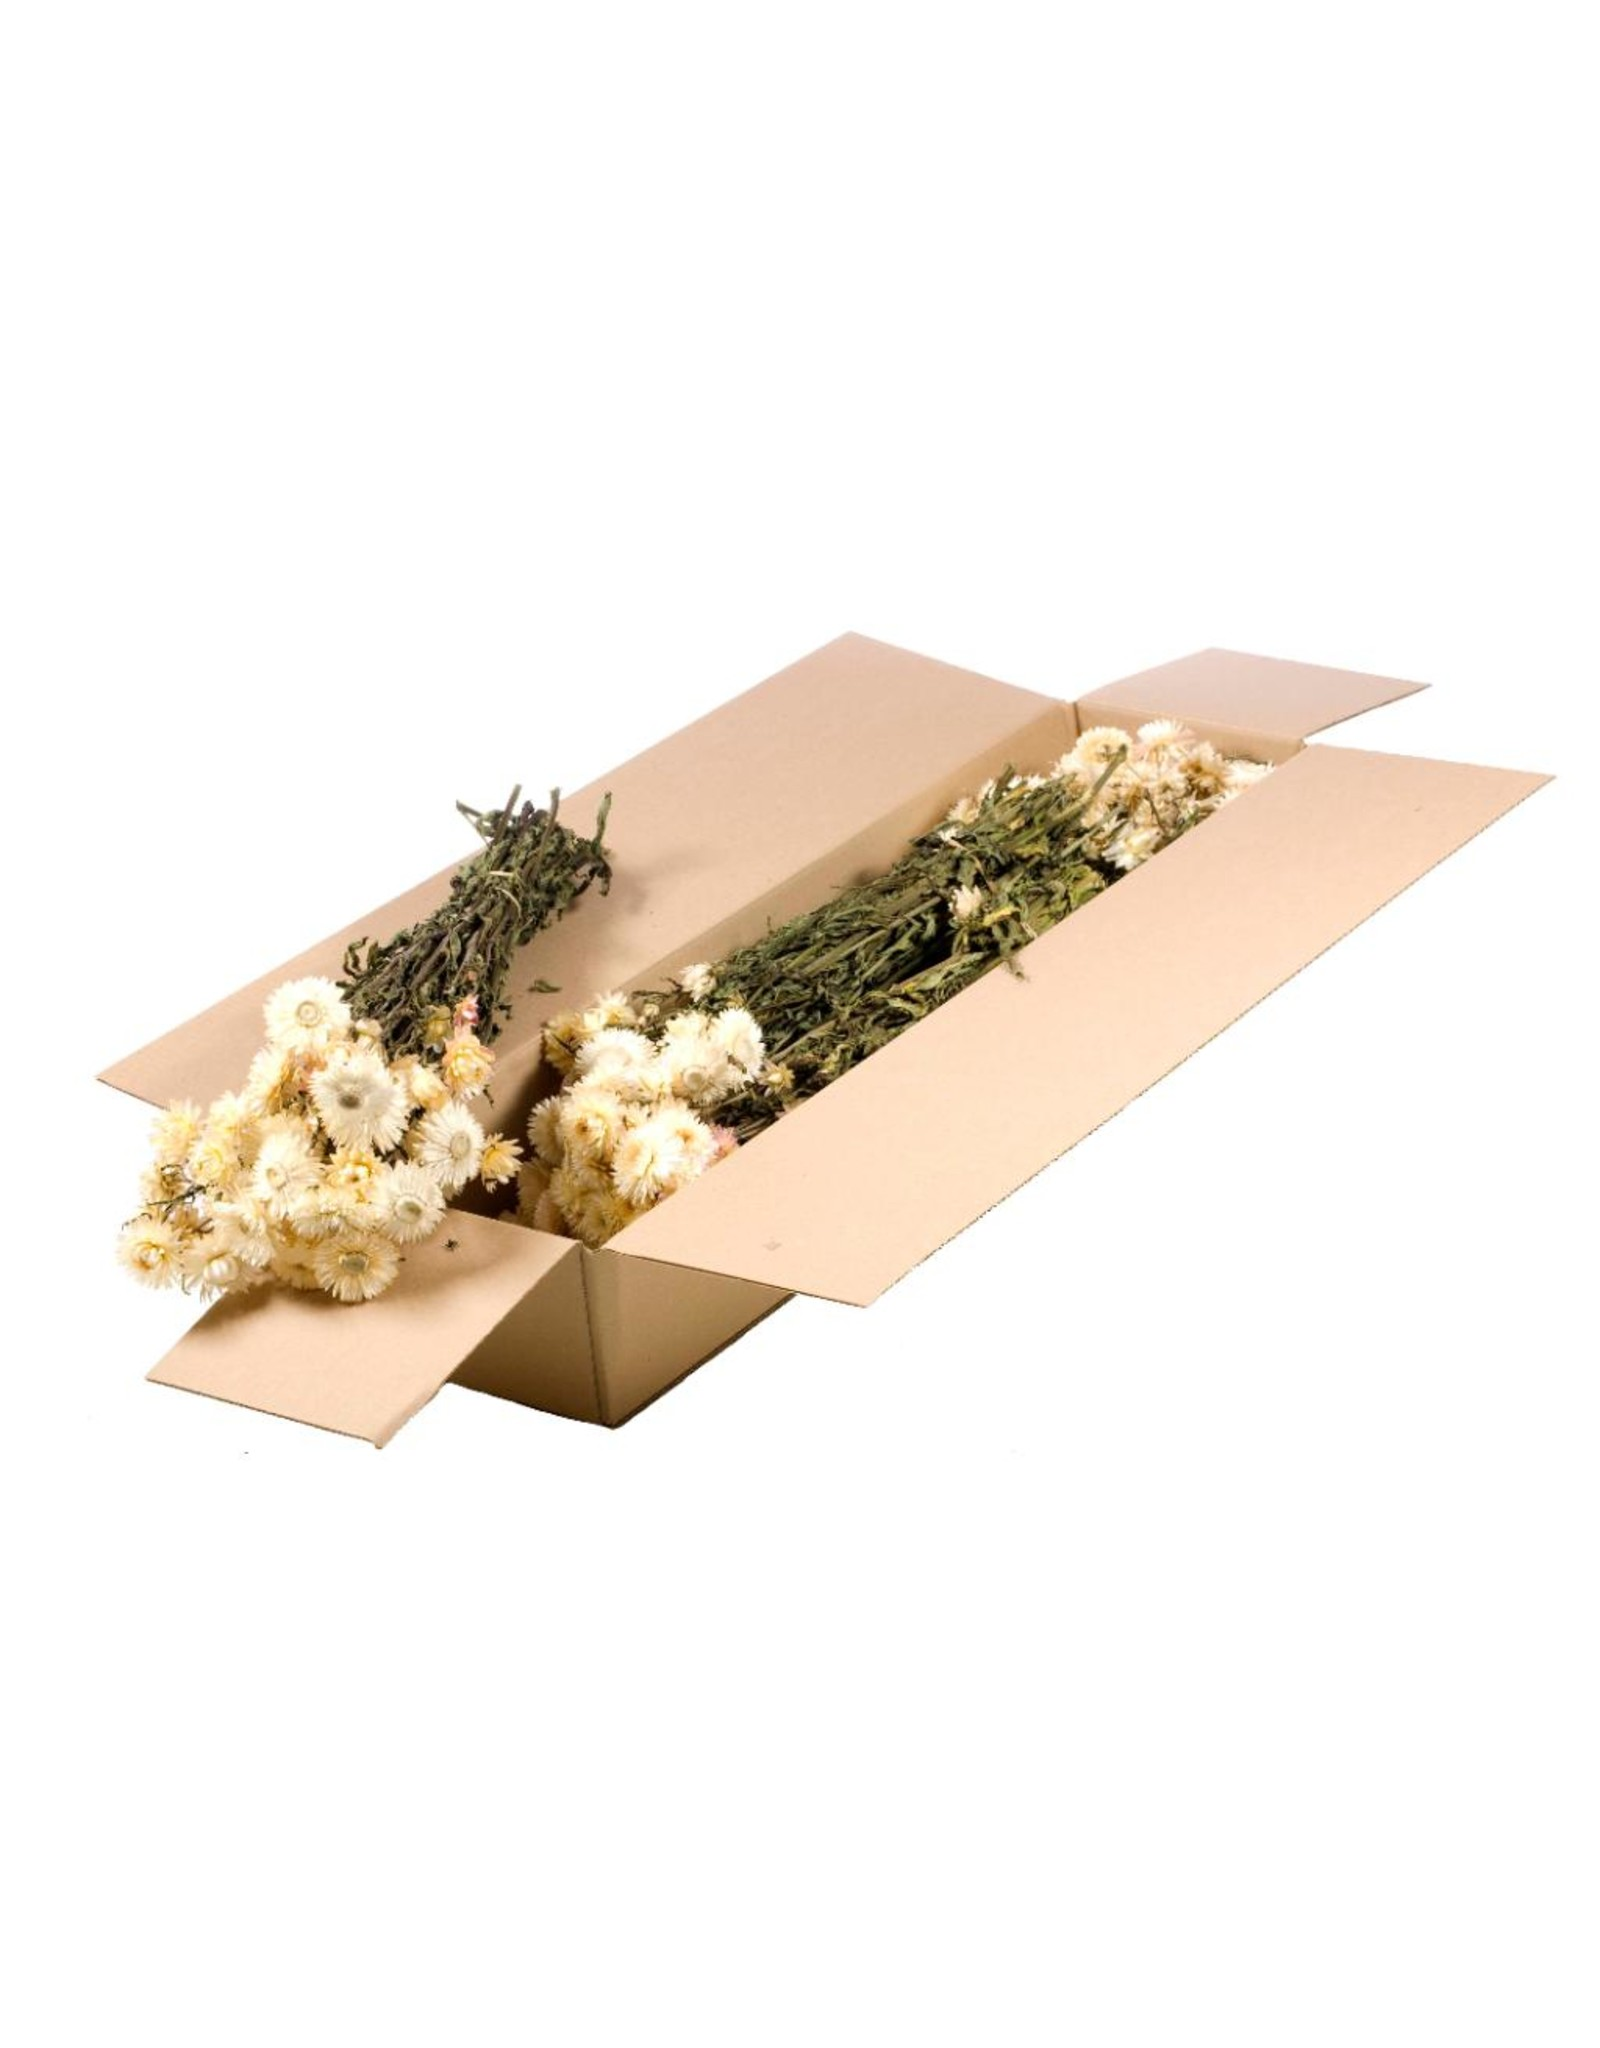 Helichrysum SB natural white x 5